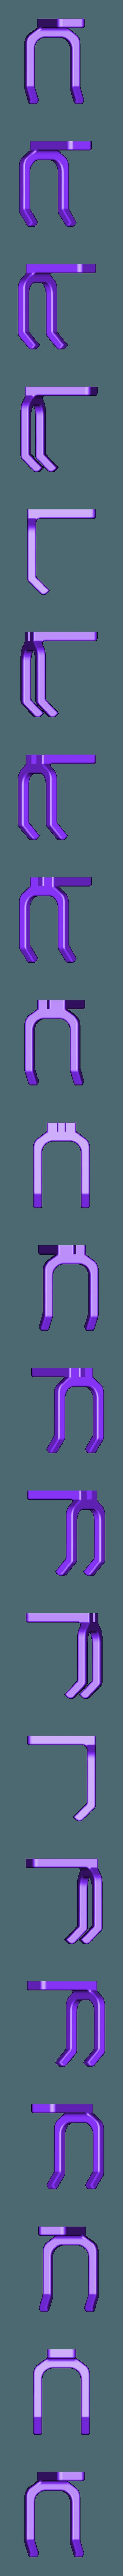 Skadis_Universal_Fork_20_30mm.stl Download free STL file IKEA SKADIS Collection (easy print / tight fit) • 3D print object, CSD_Salzburg